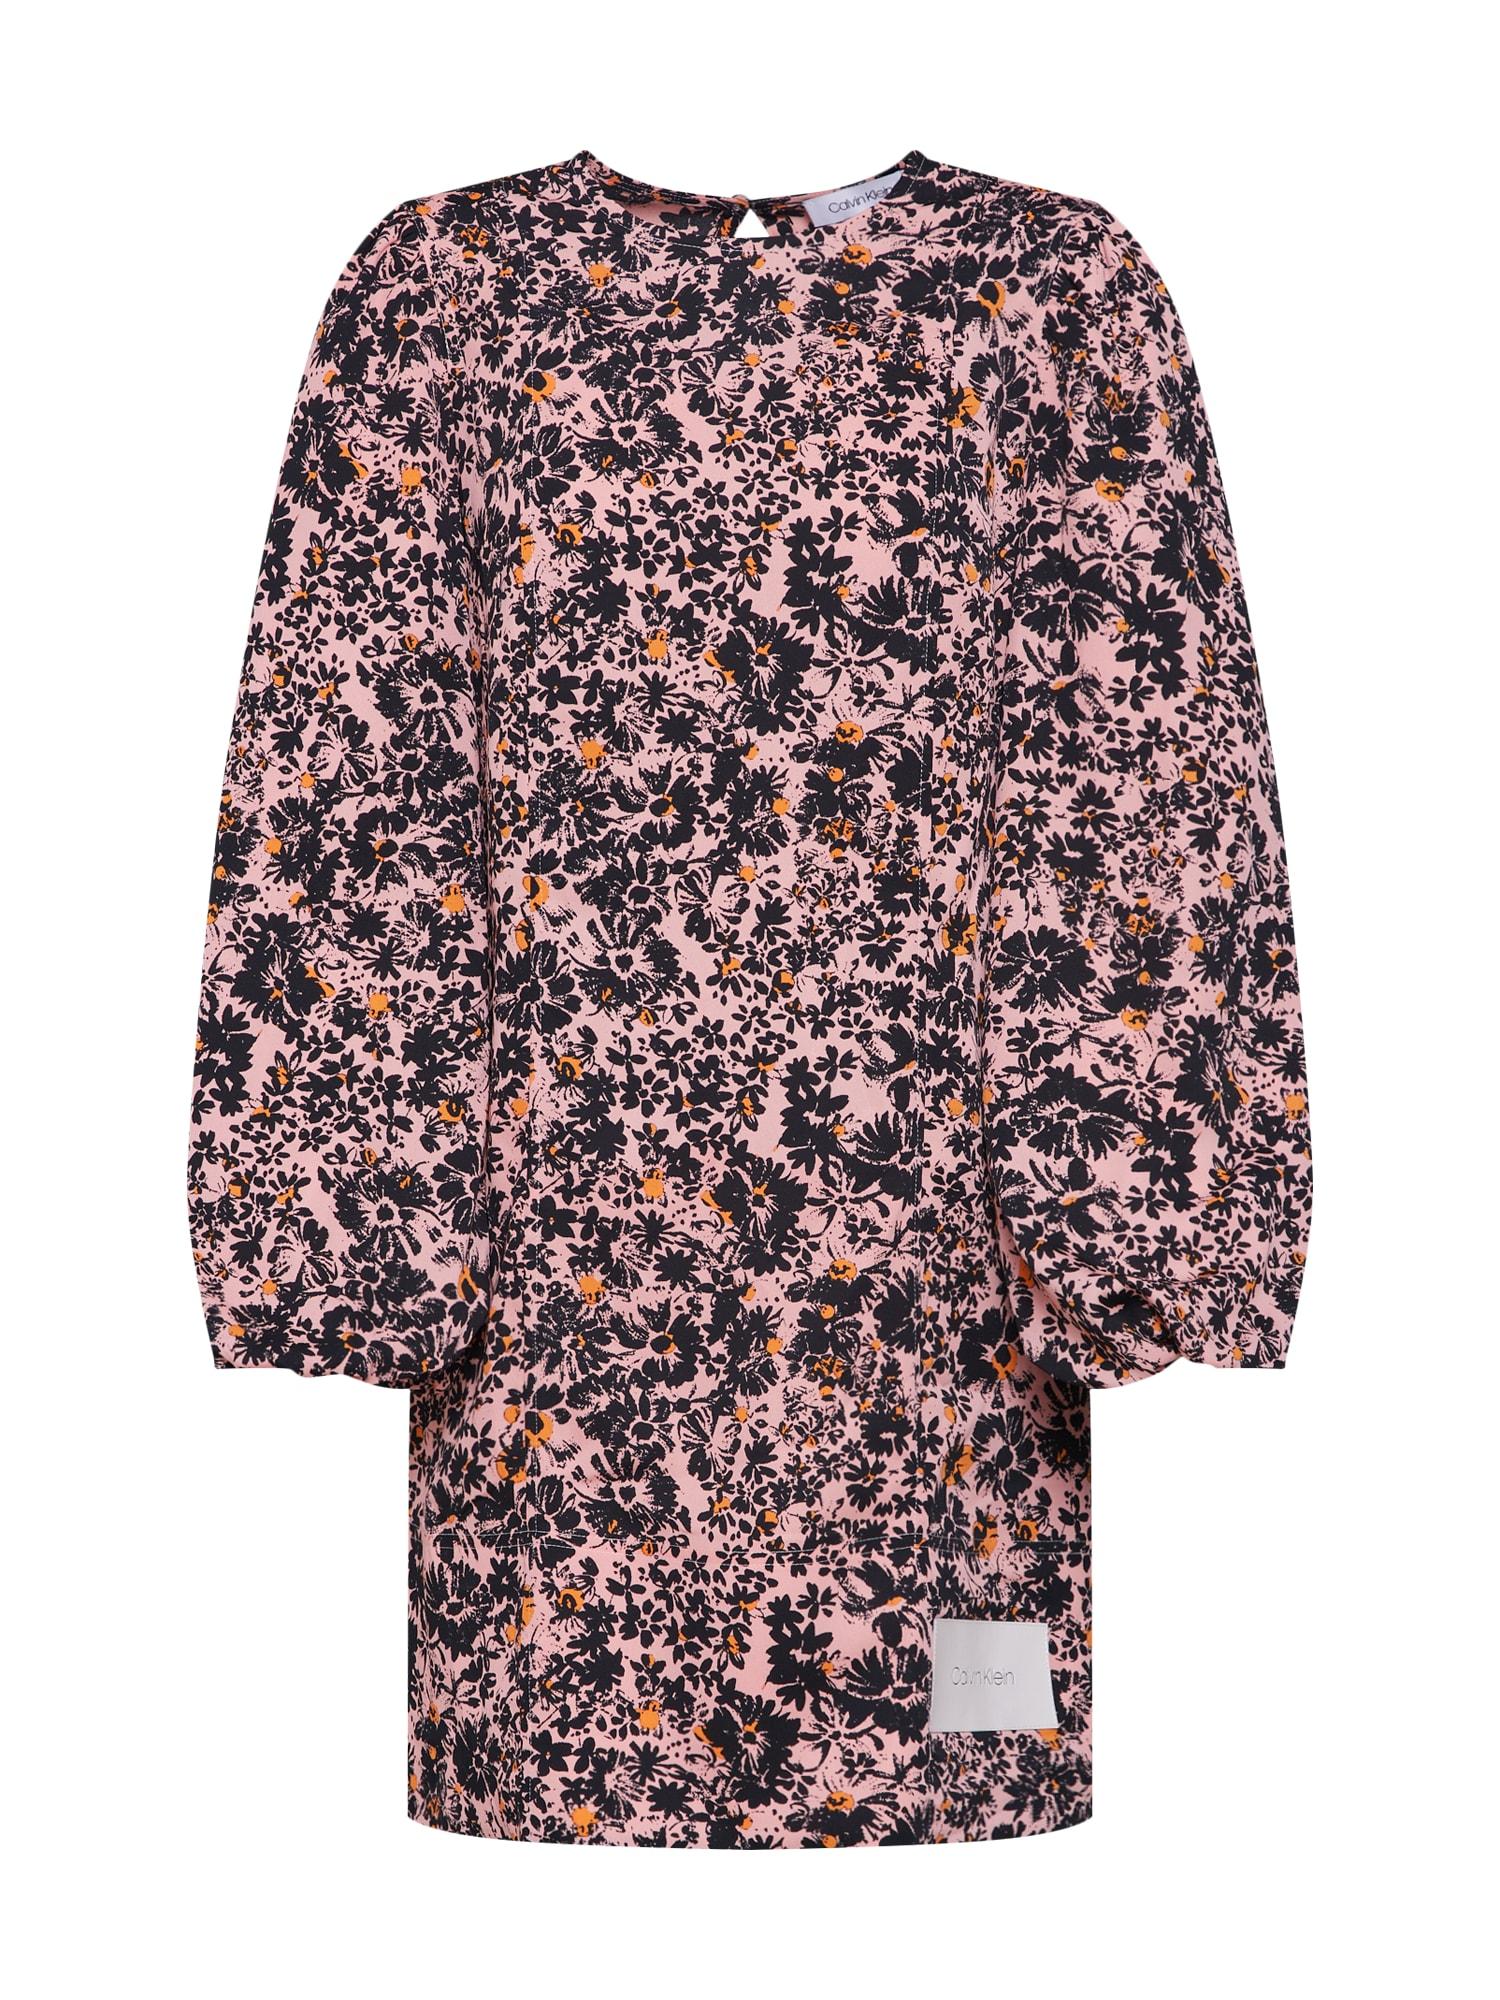 Šaty PUFF mix barev růžová Calvin Klein